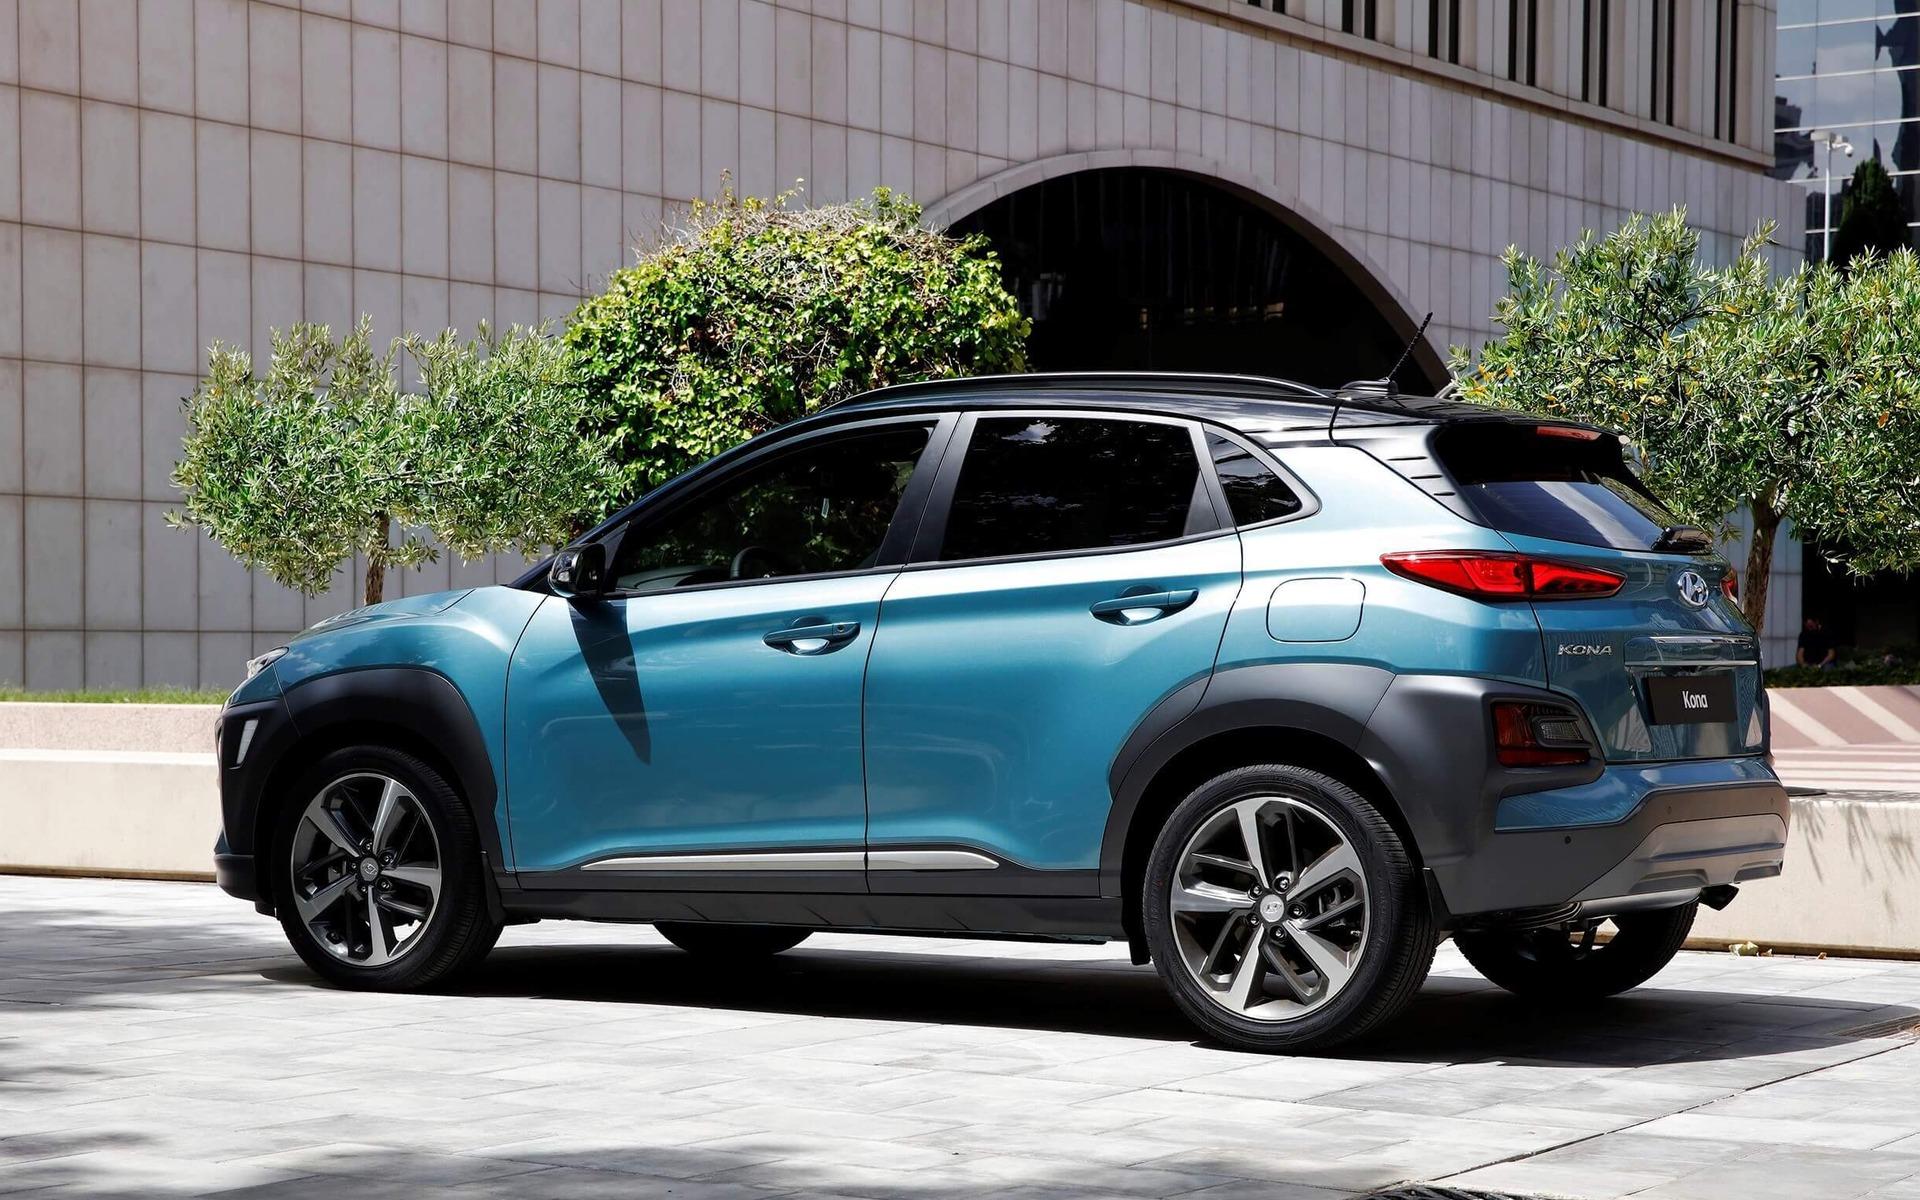 Meilleurs achats 2019 du Guide de l'auto : Hyundai Kona 359119_2019_Hyundai_Kona